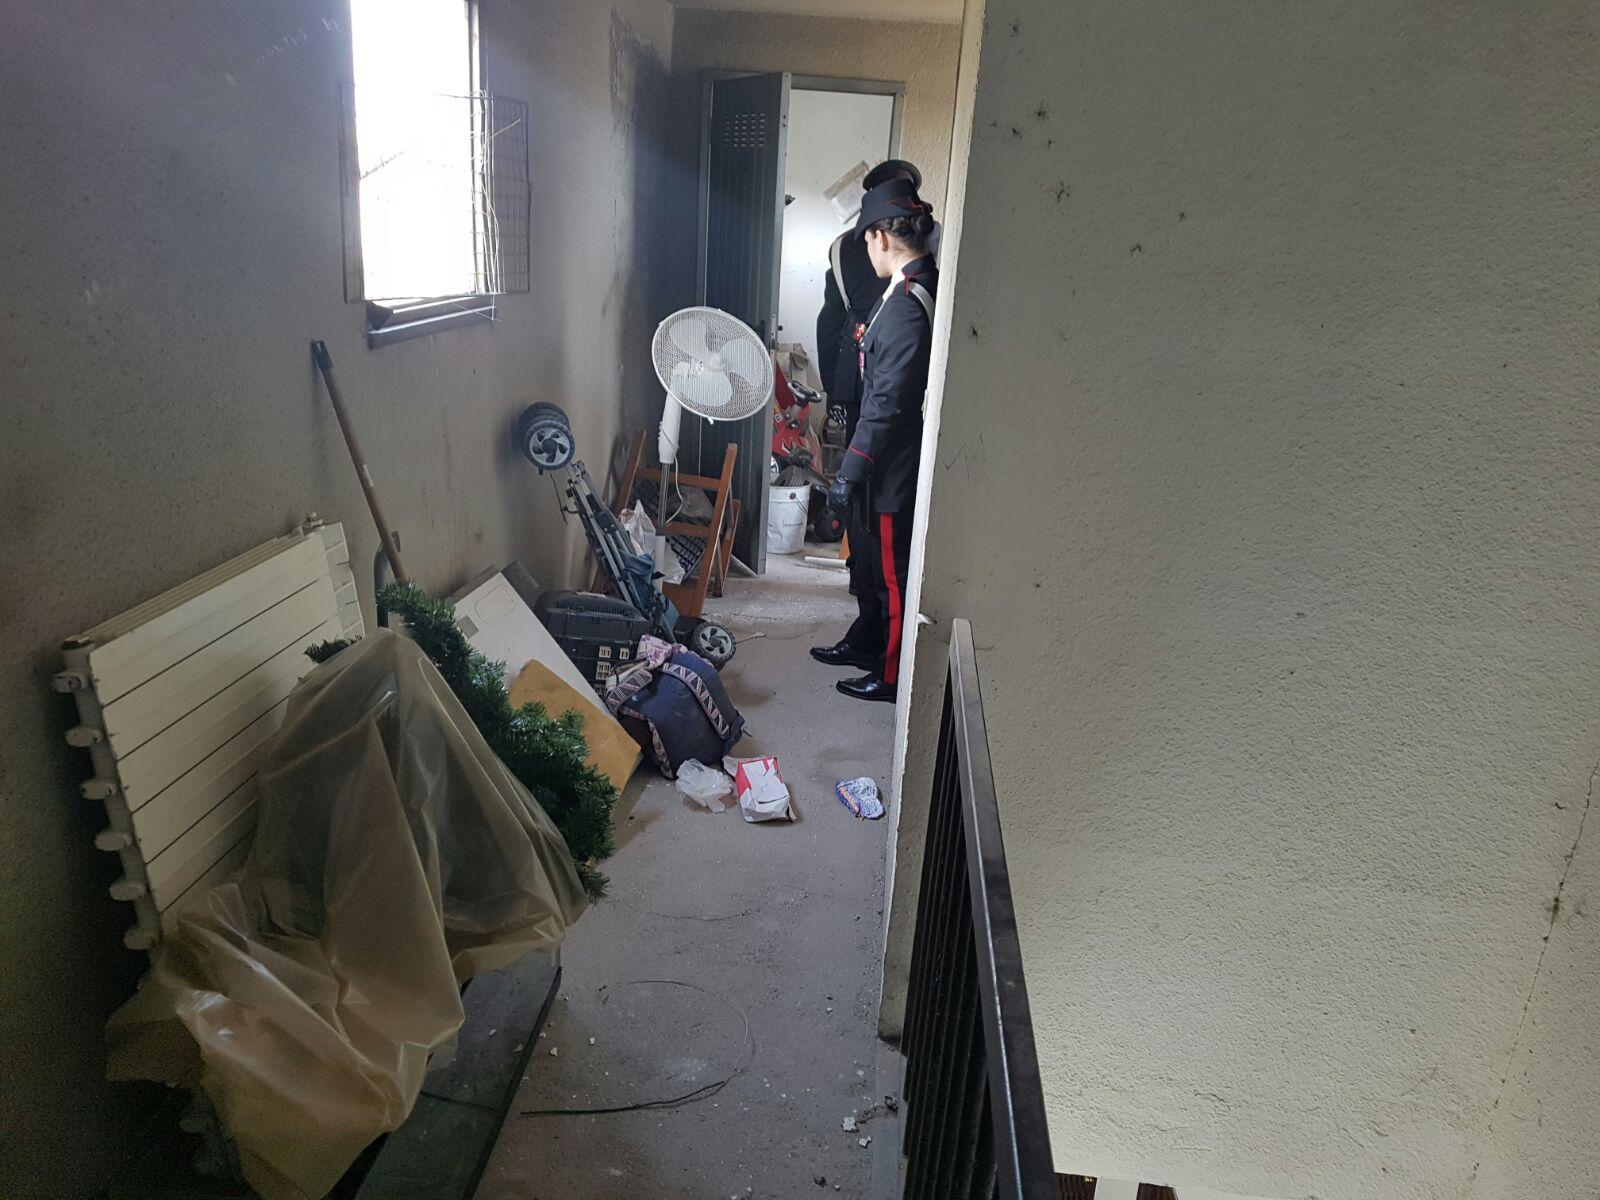 pushere carabinieri droga roma